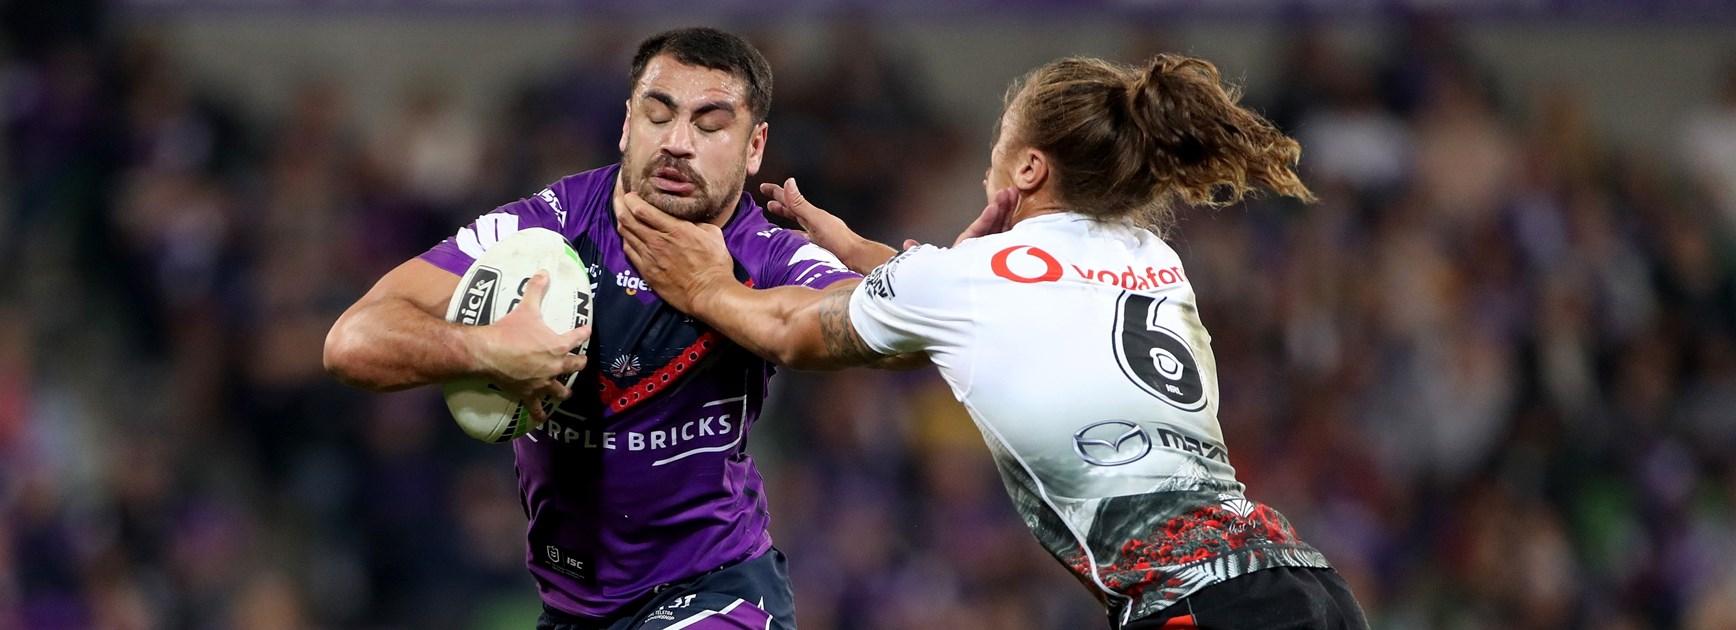 Slater in ear of Hughes to get fullback to speak up